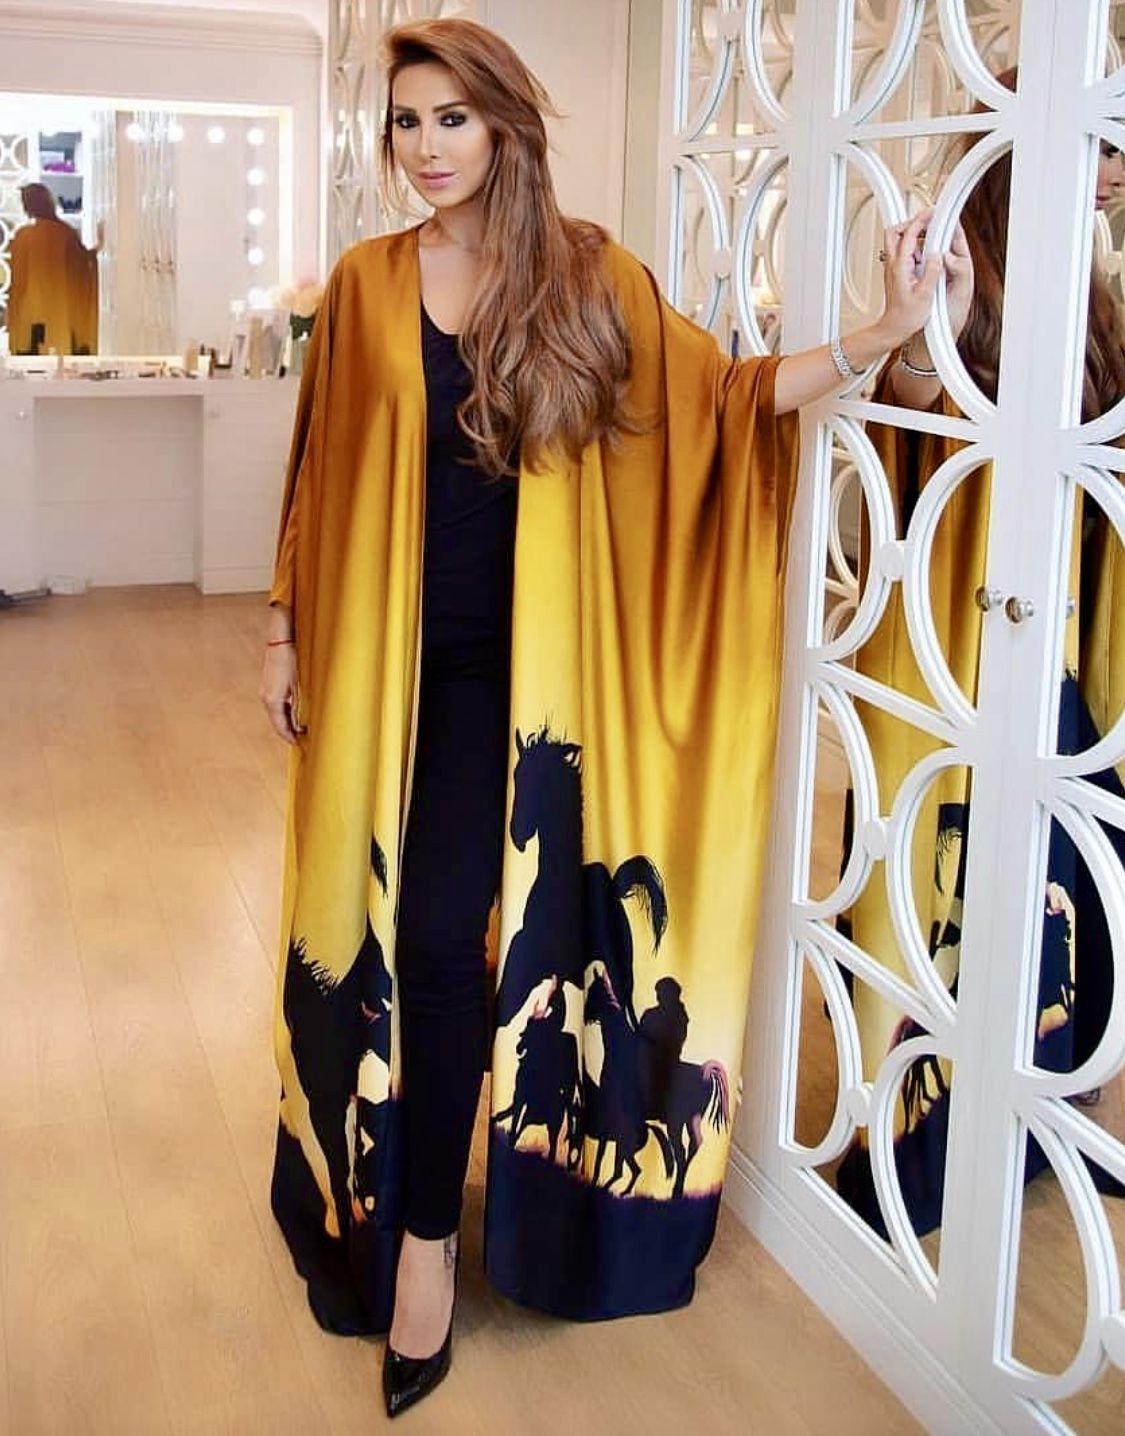 bab76c23461515 Joelle Muslim Women Fashion, Arab Fashion, Kimono Fashion, Leggings Fashion,  Fashion Outfits